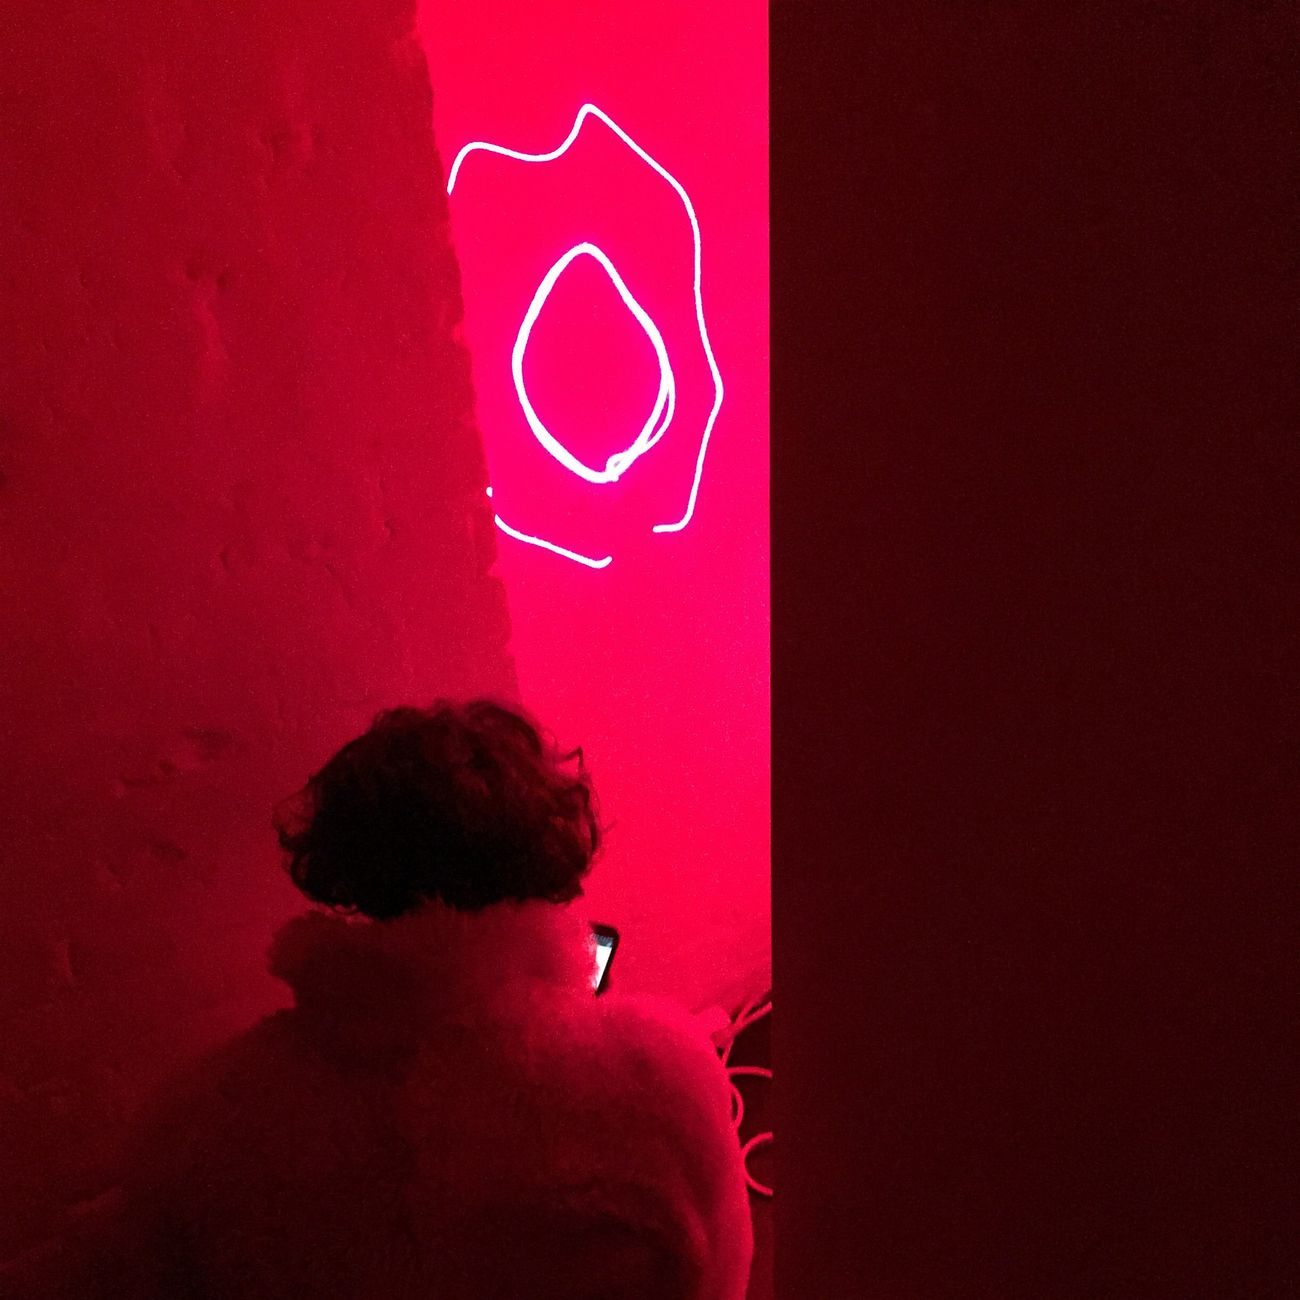 Nofilter Fluo  Music Light Experimental